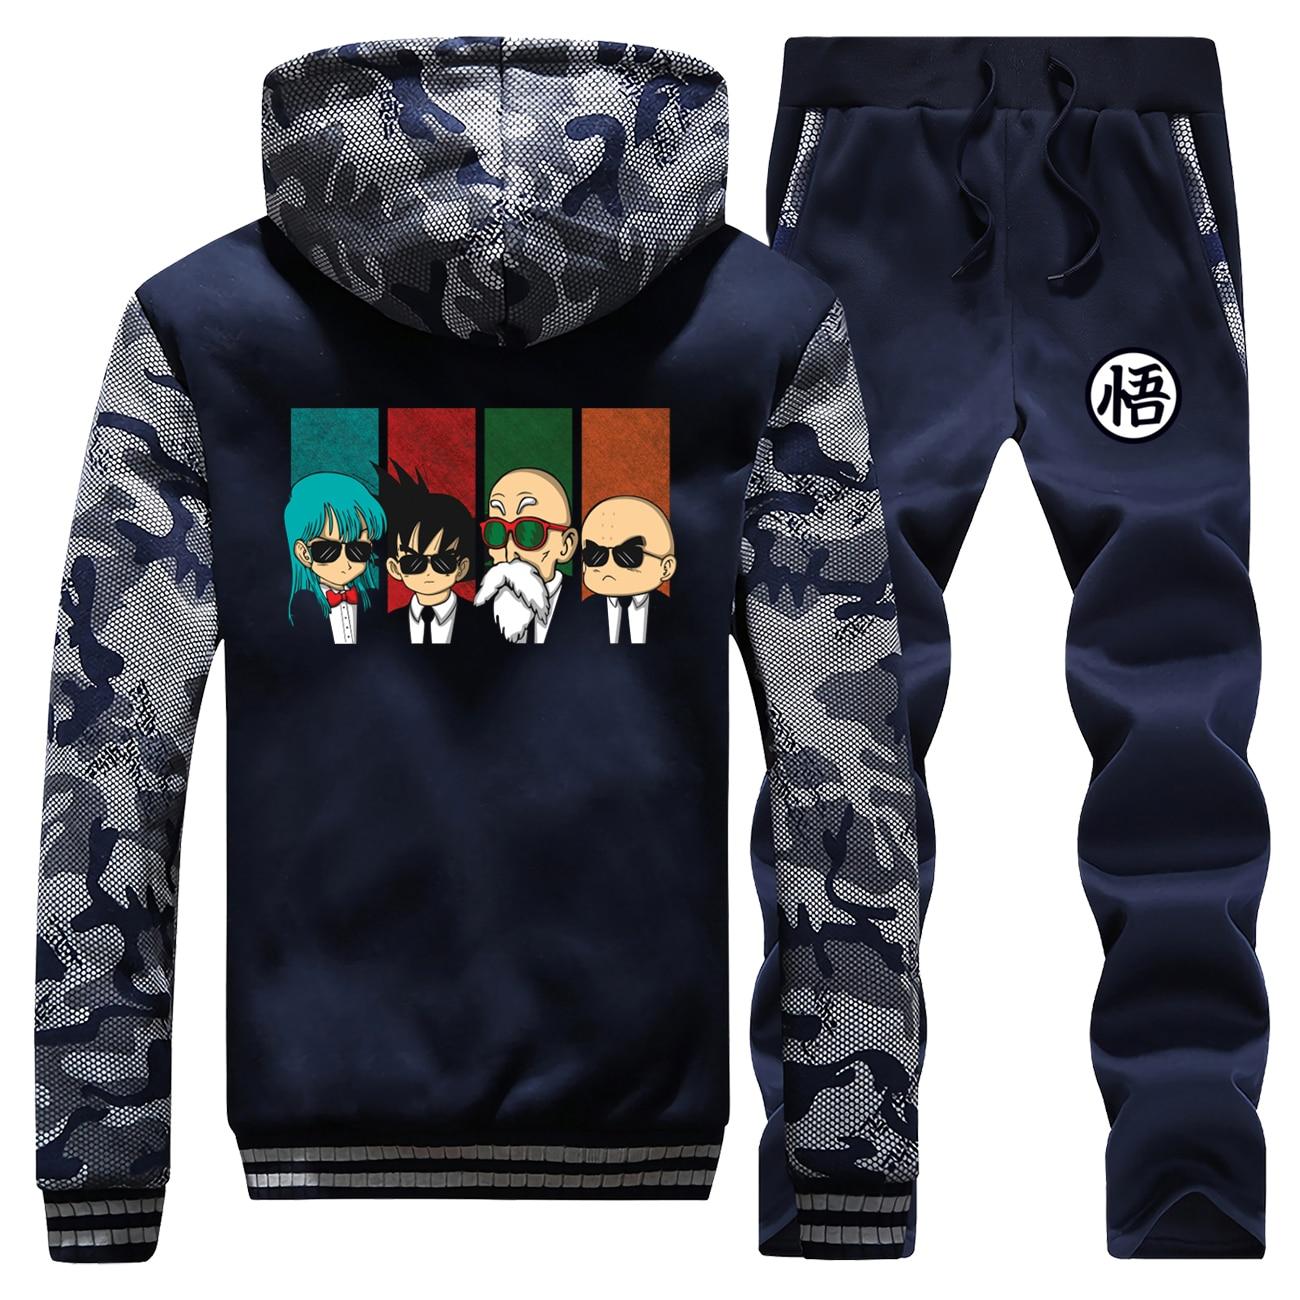 Dragon Sweatshirt Sportswear Set Male Hoodie Sporting Suits Ball New Winter Tracksuits Men Set Thicken Hoodies + Pants 2Pcs Suit